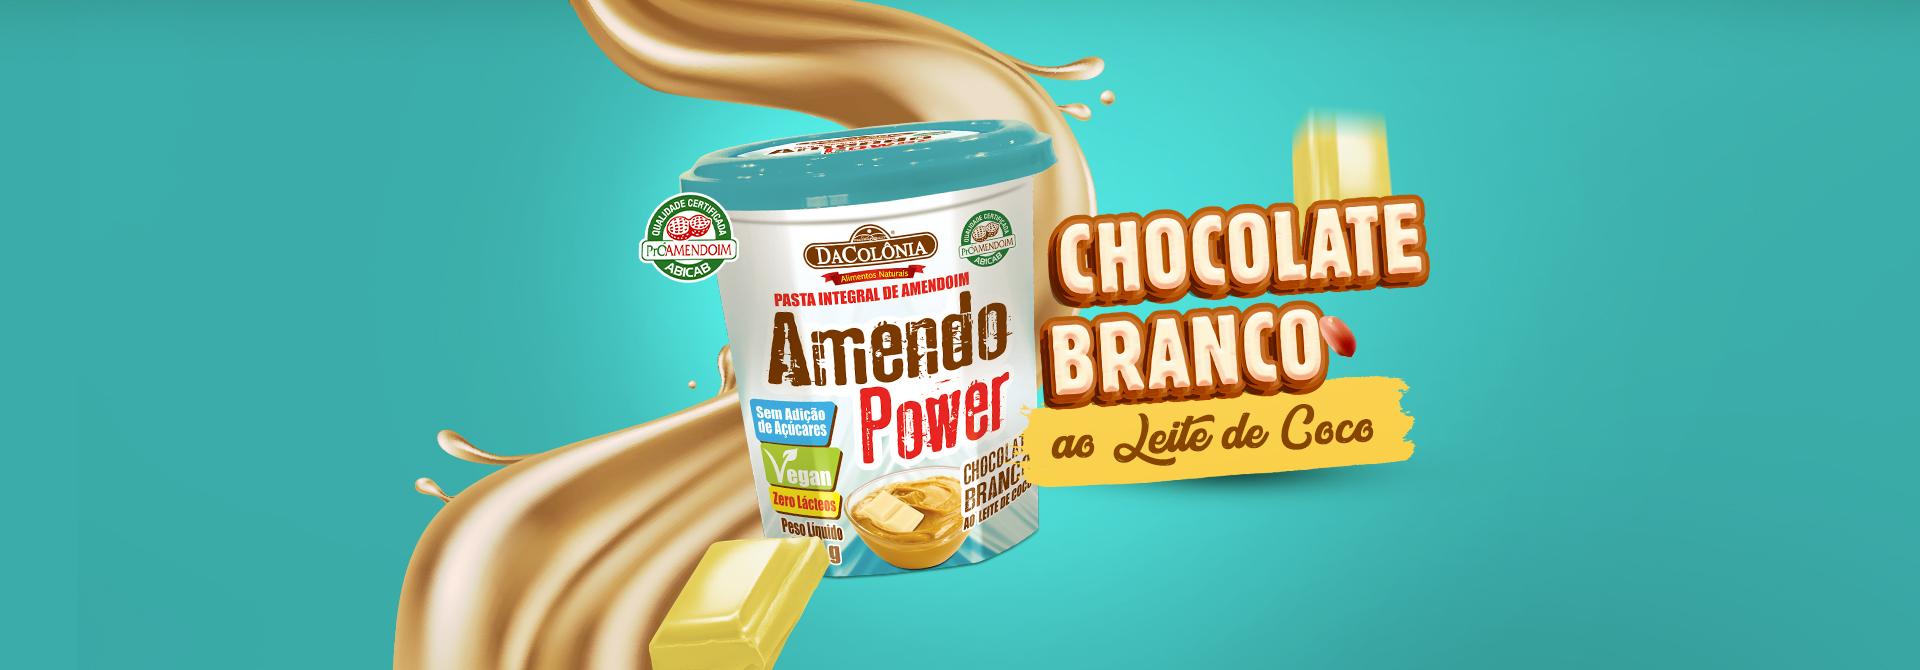 Banner Amendo Power Chocolate Branco